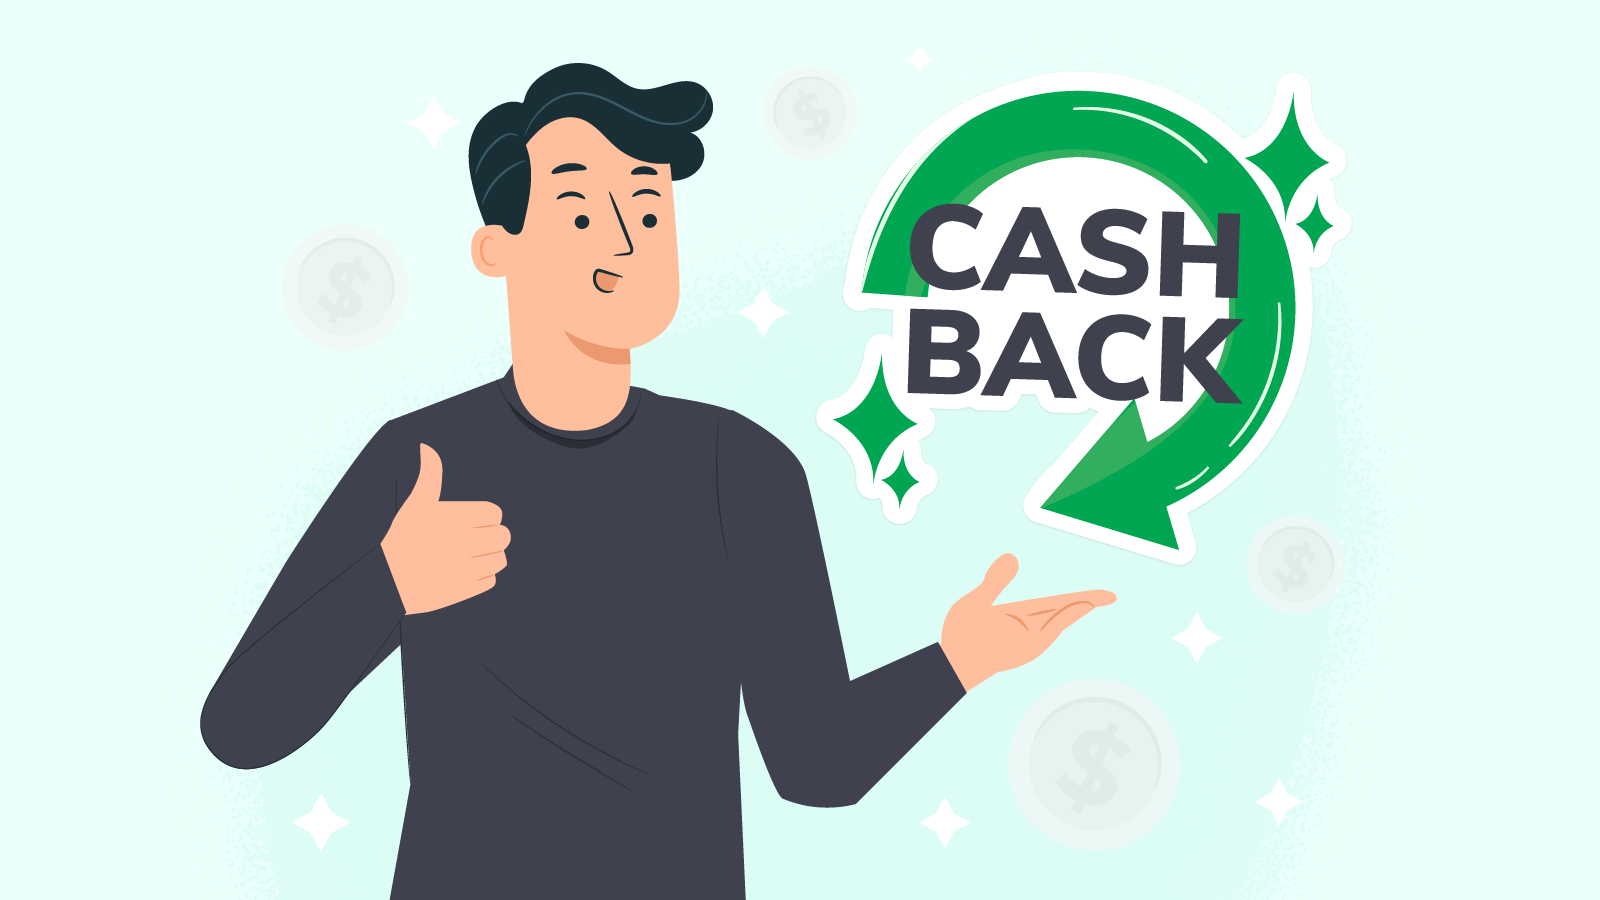 The best cashback bonus choices for 2021